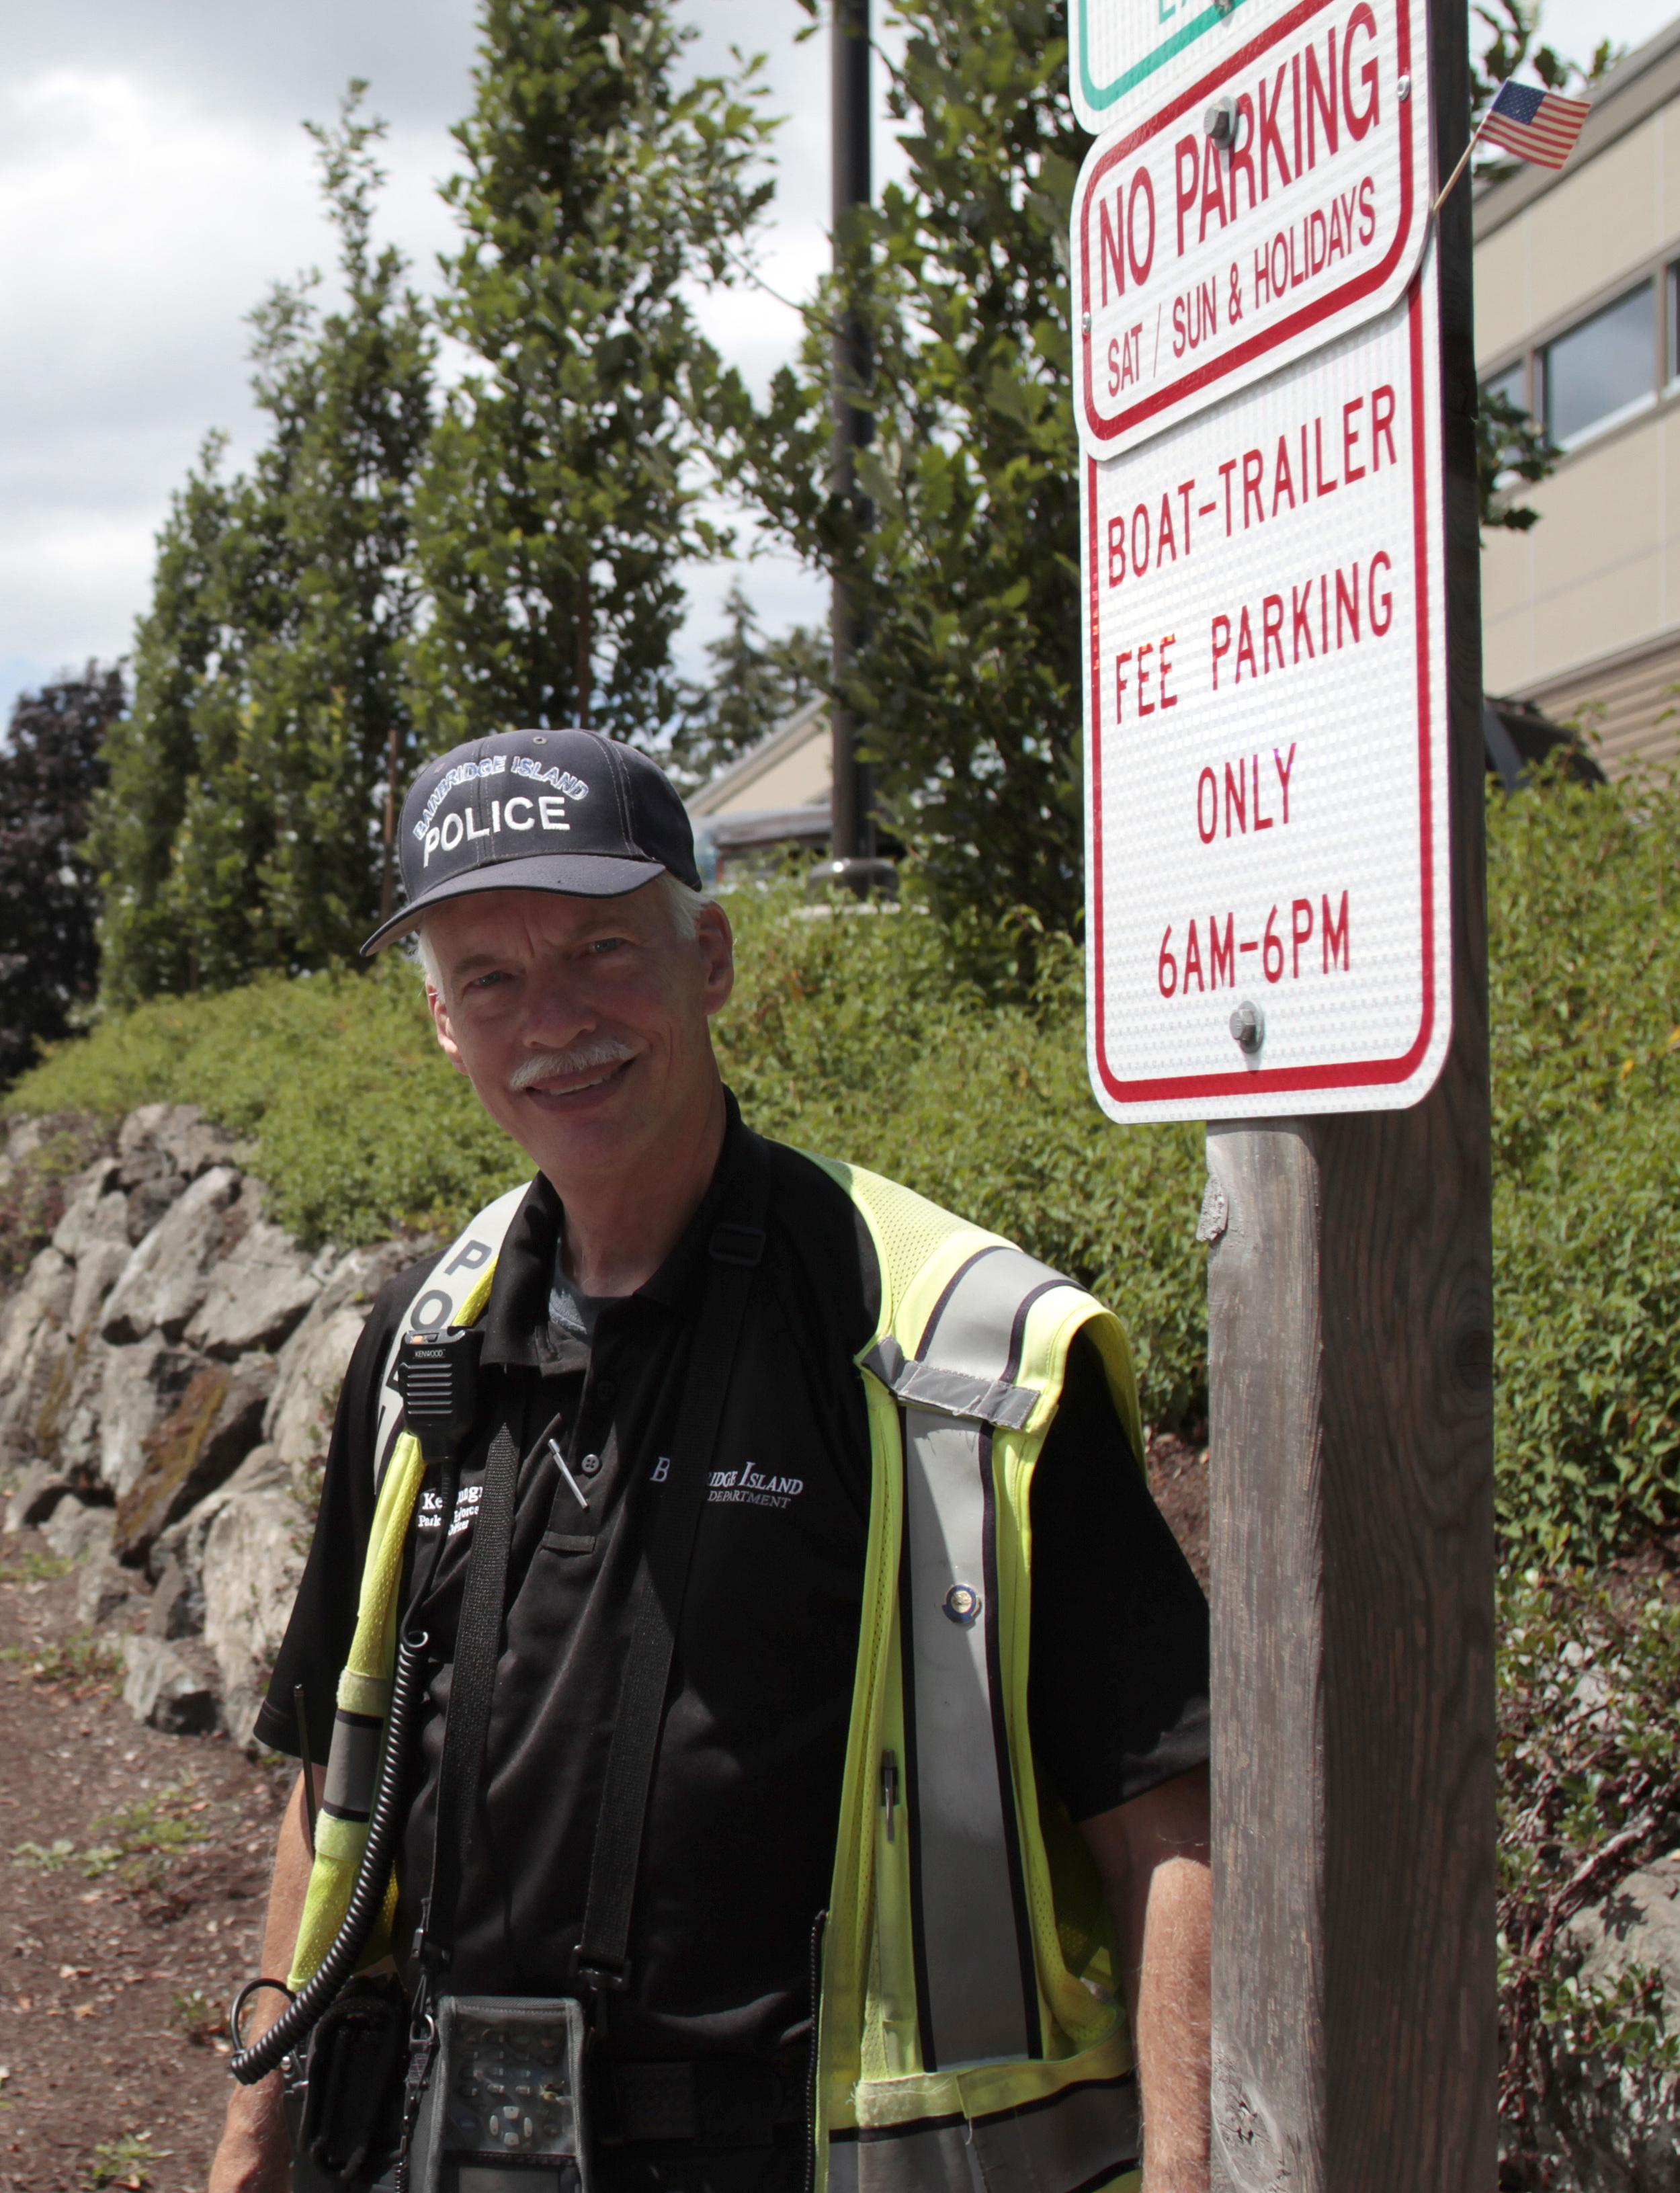 Bainbridge Island Police Department Parking Enforcement Officer Ken Lundgren.